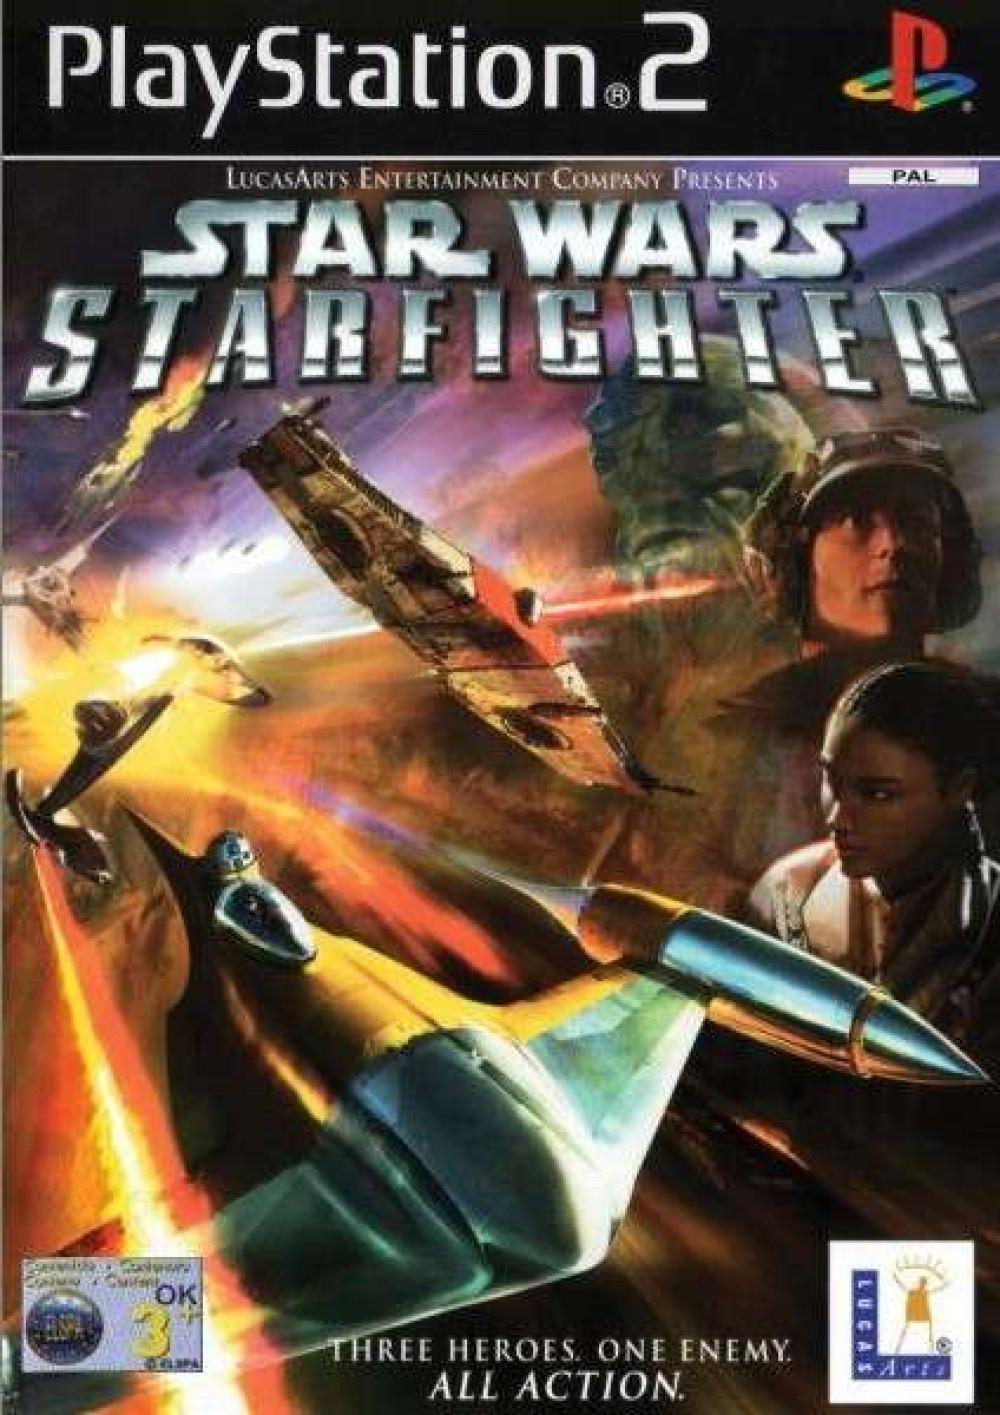 Star Wars Starfighter PS2